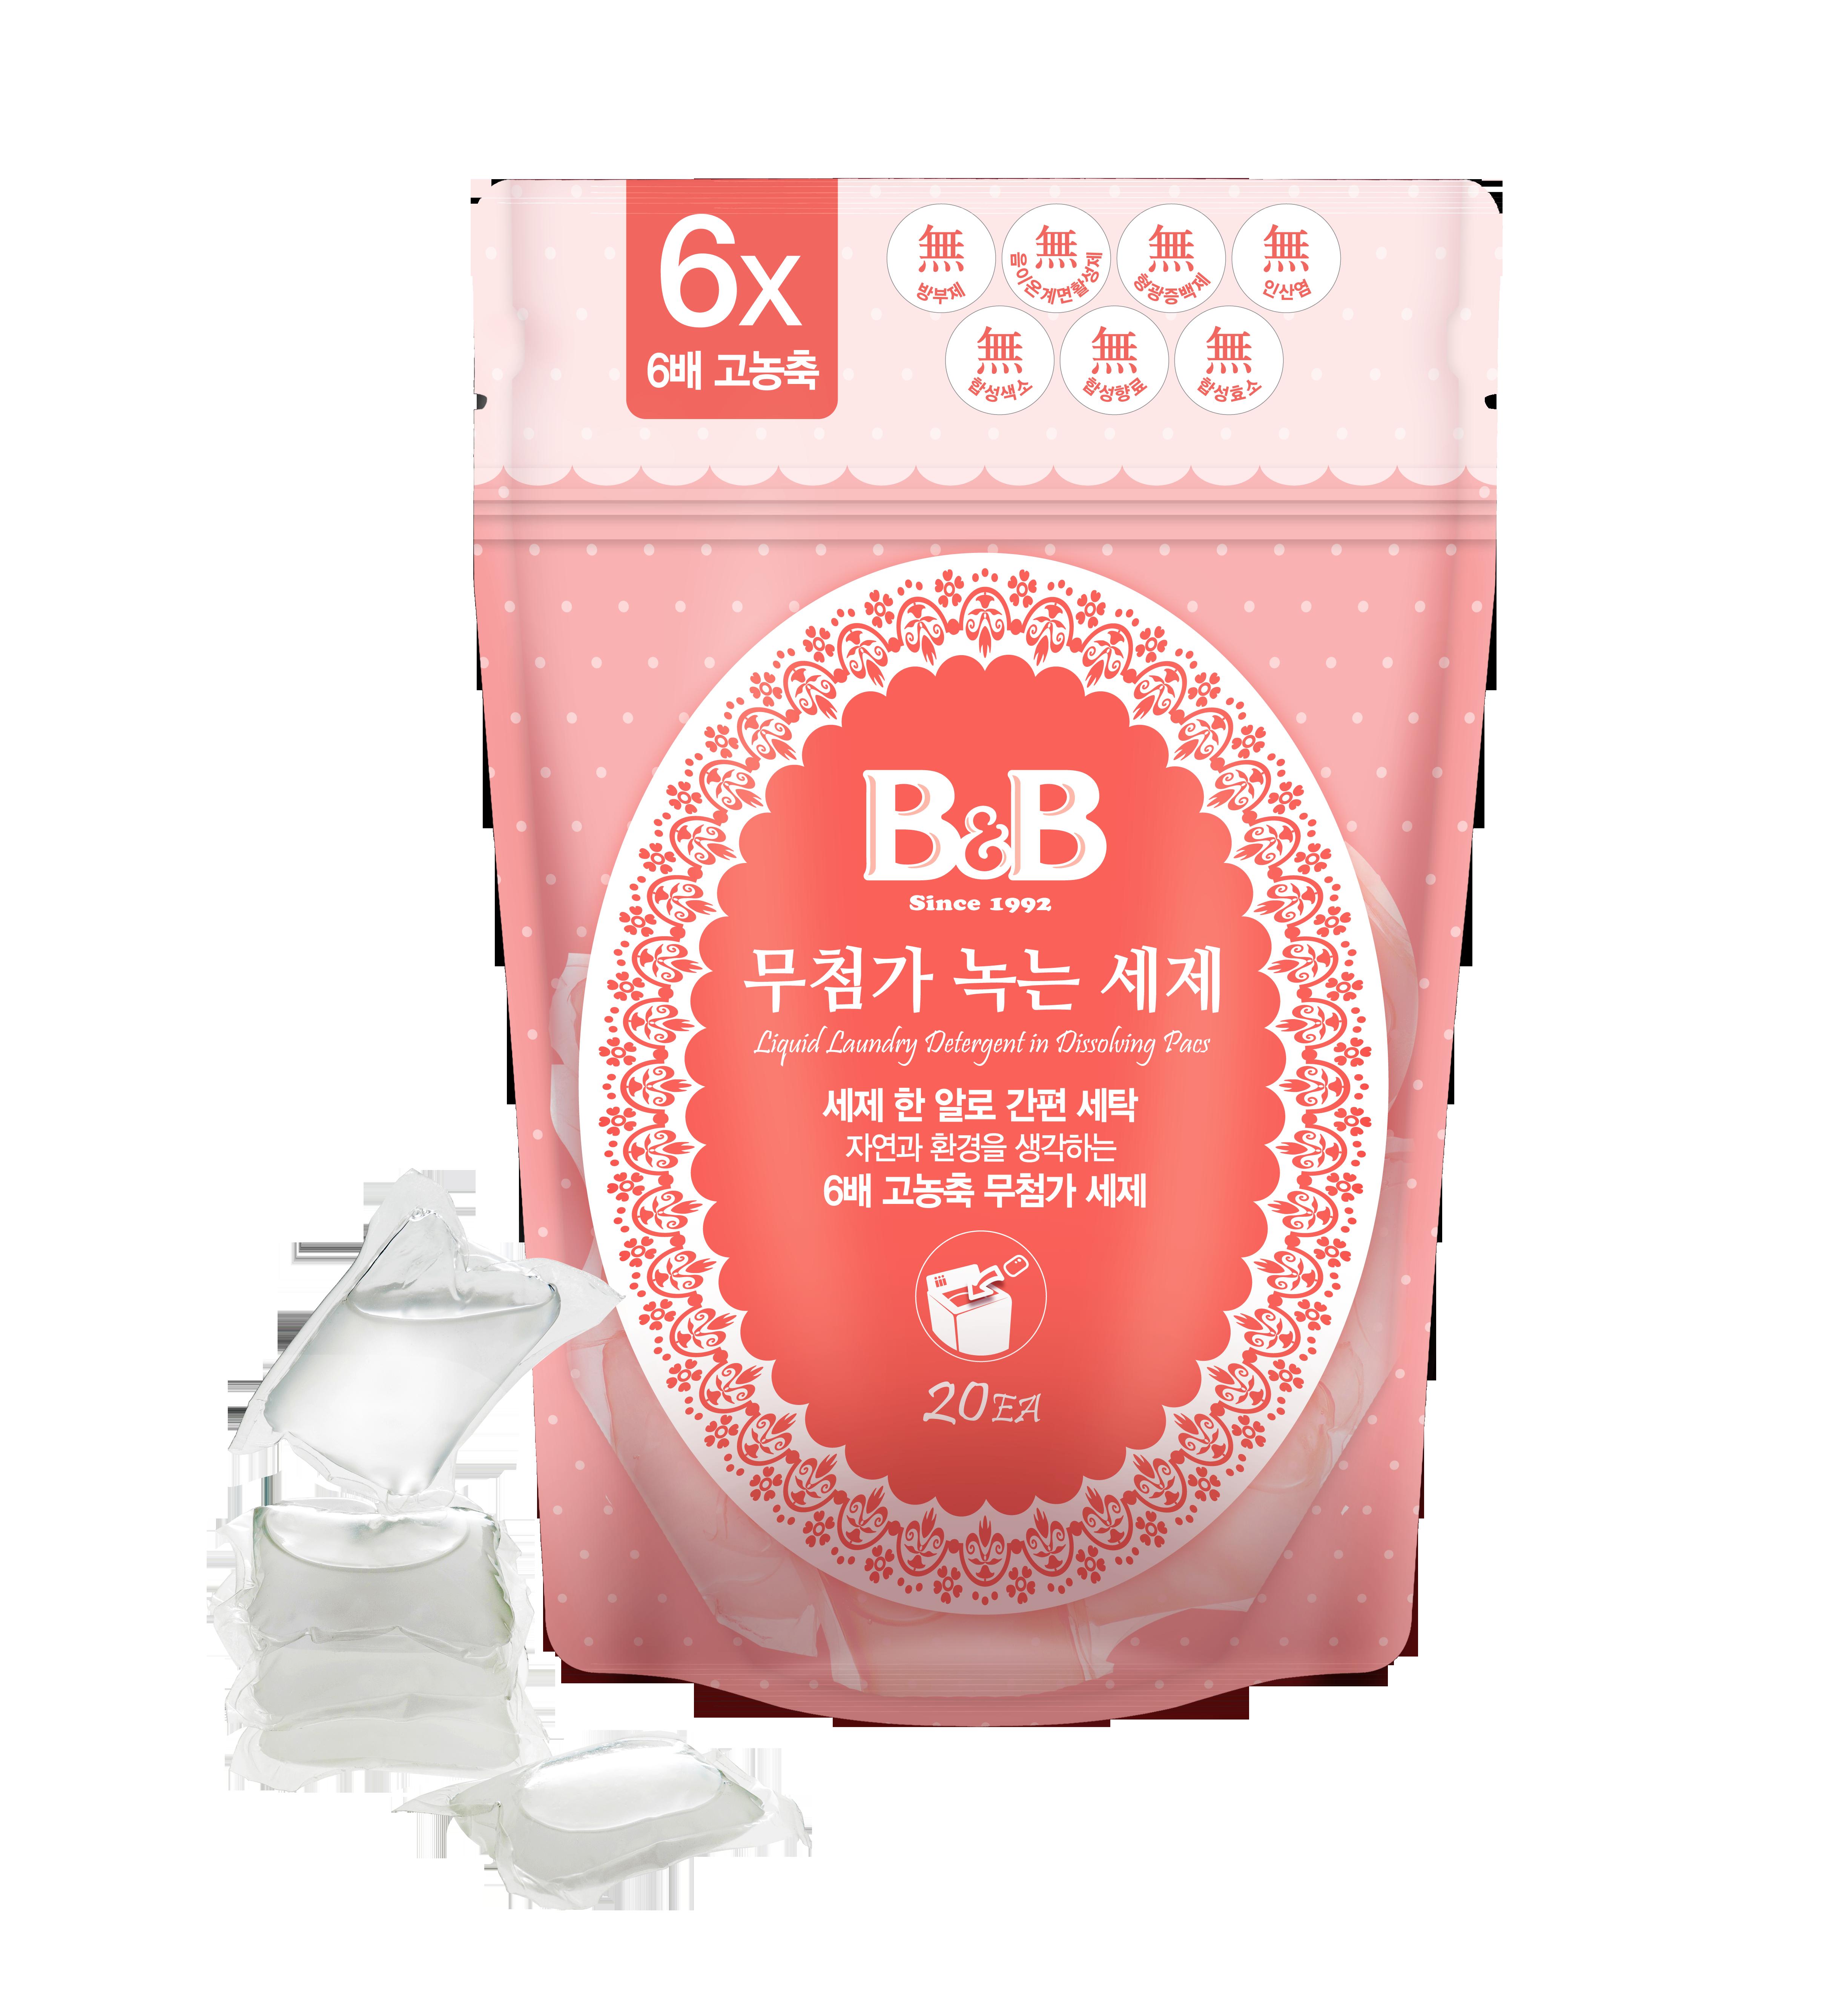 B&B Laundry Detergent Pack